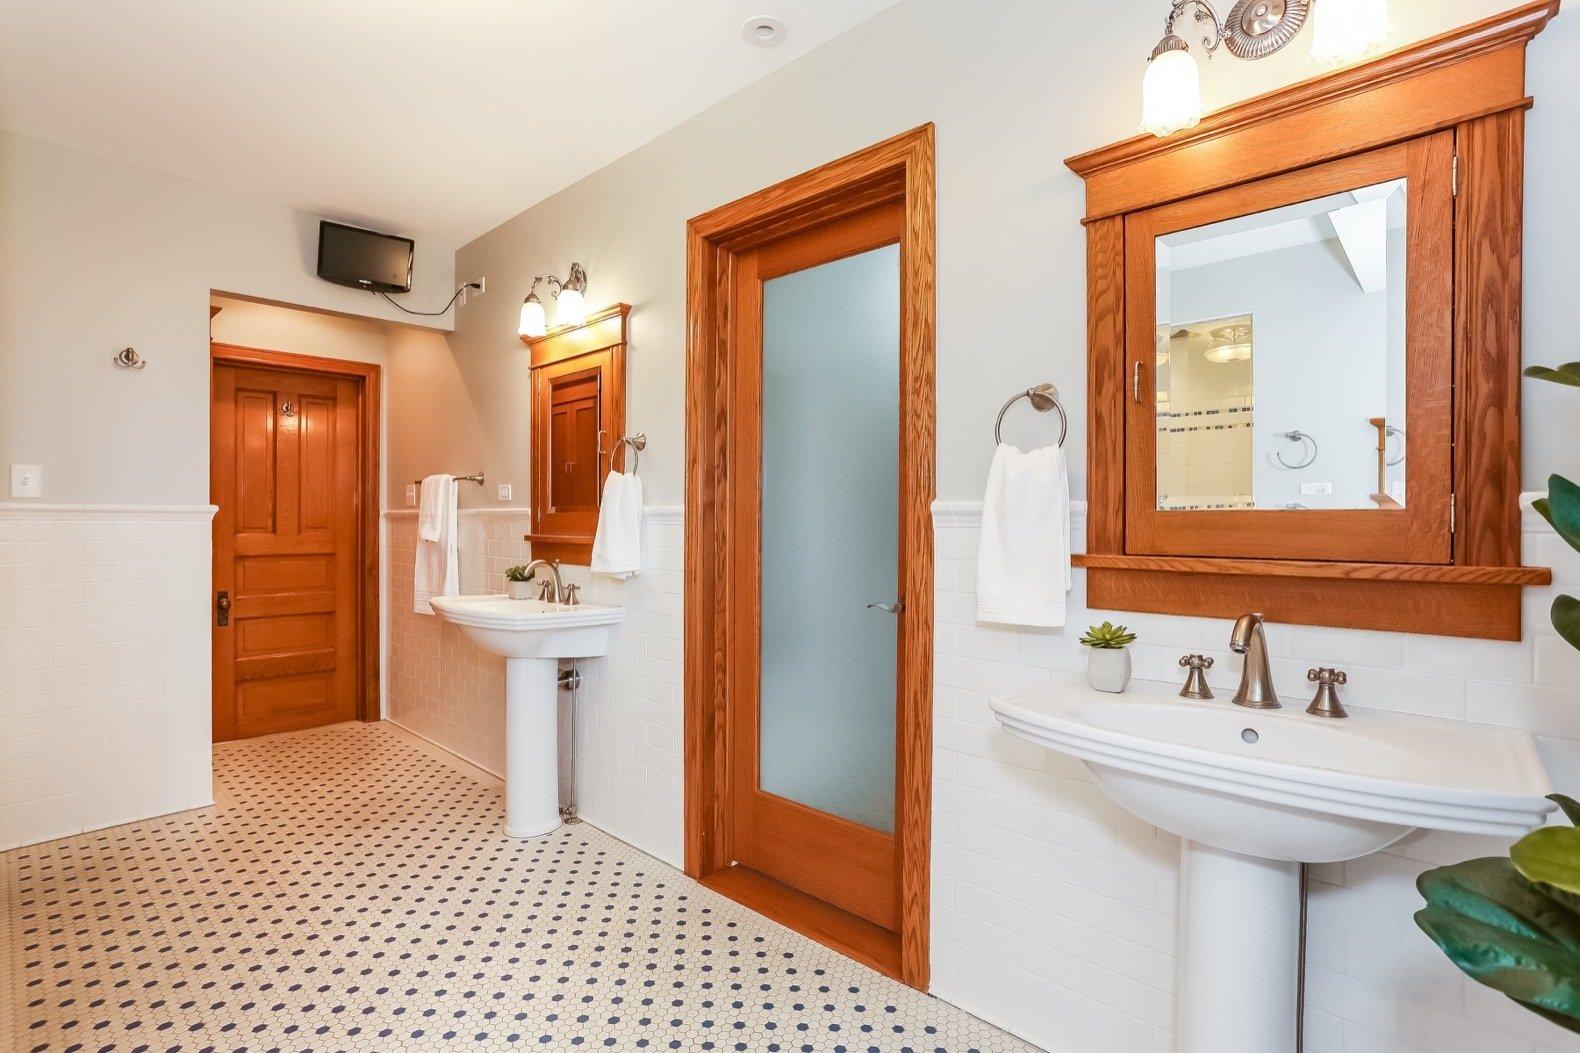 W. Irving Clark House master bath